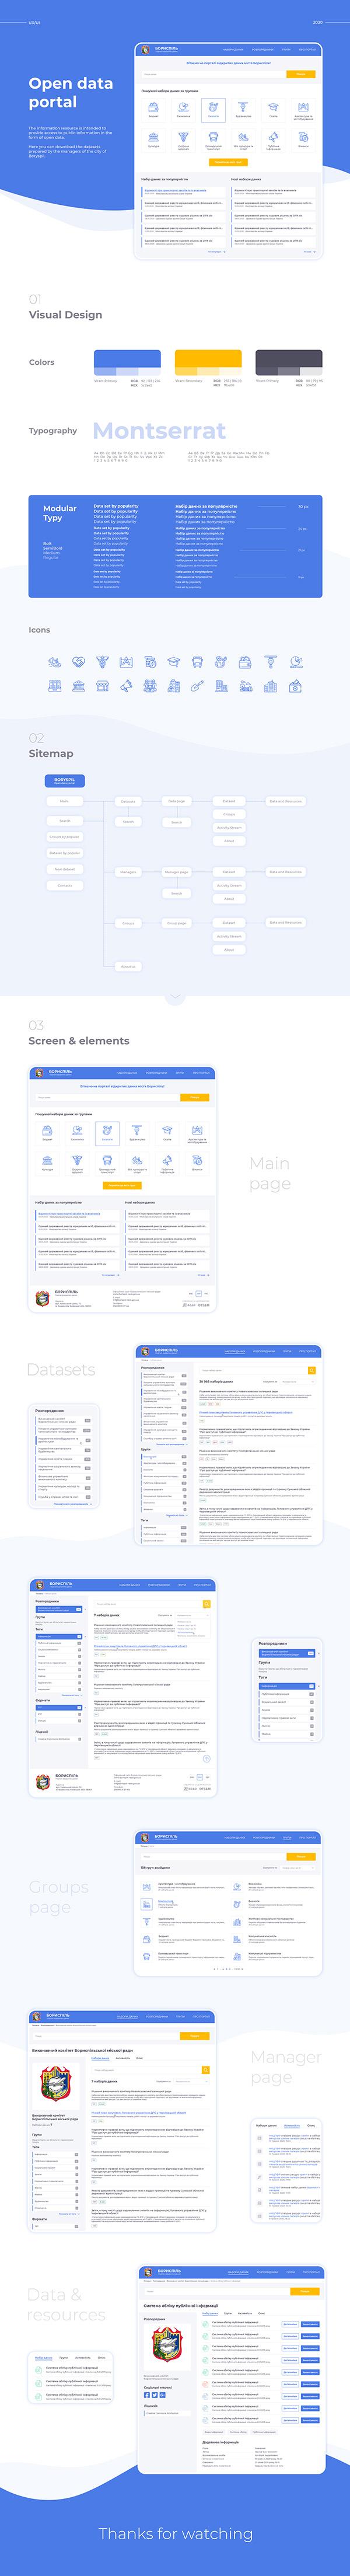 BORYSPIL Open data portal